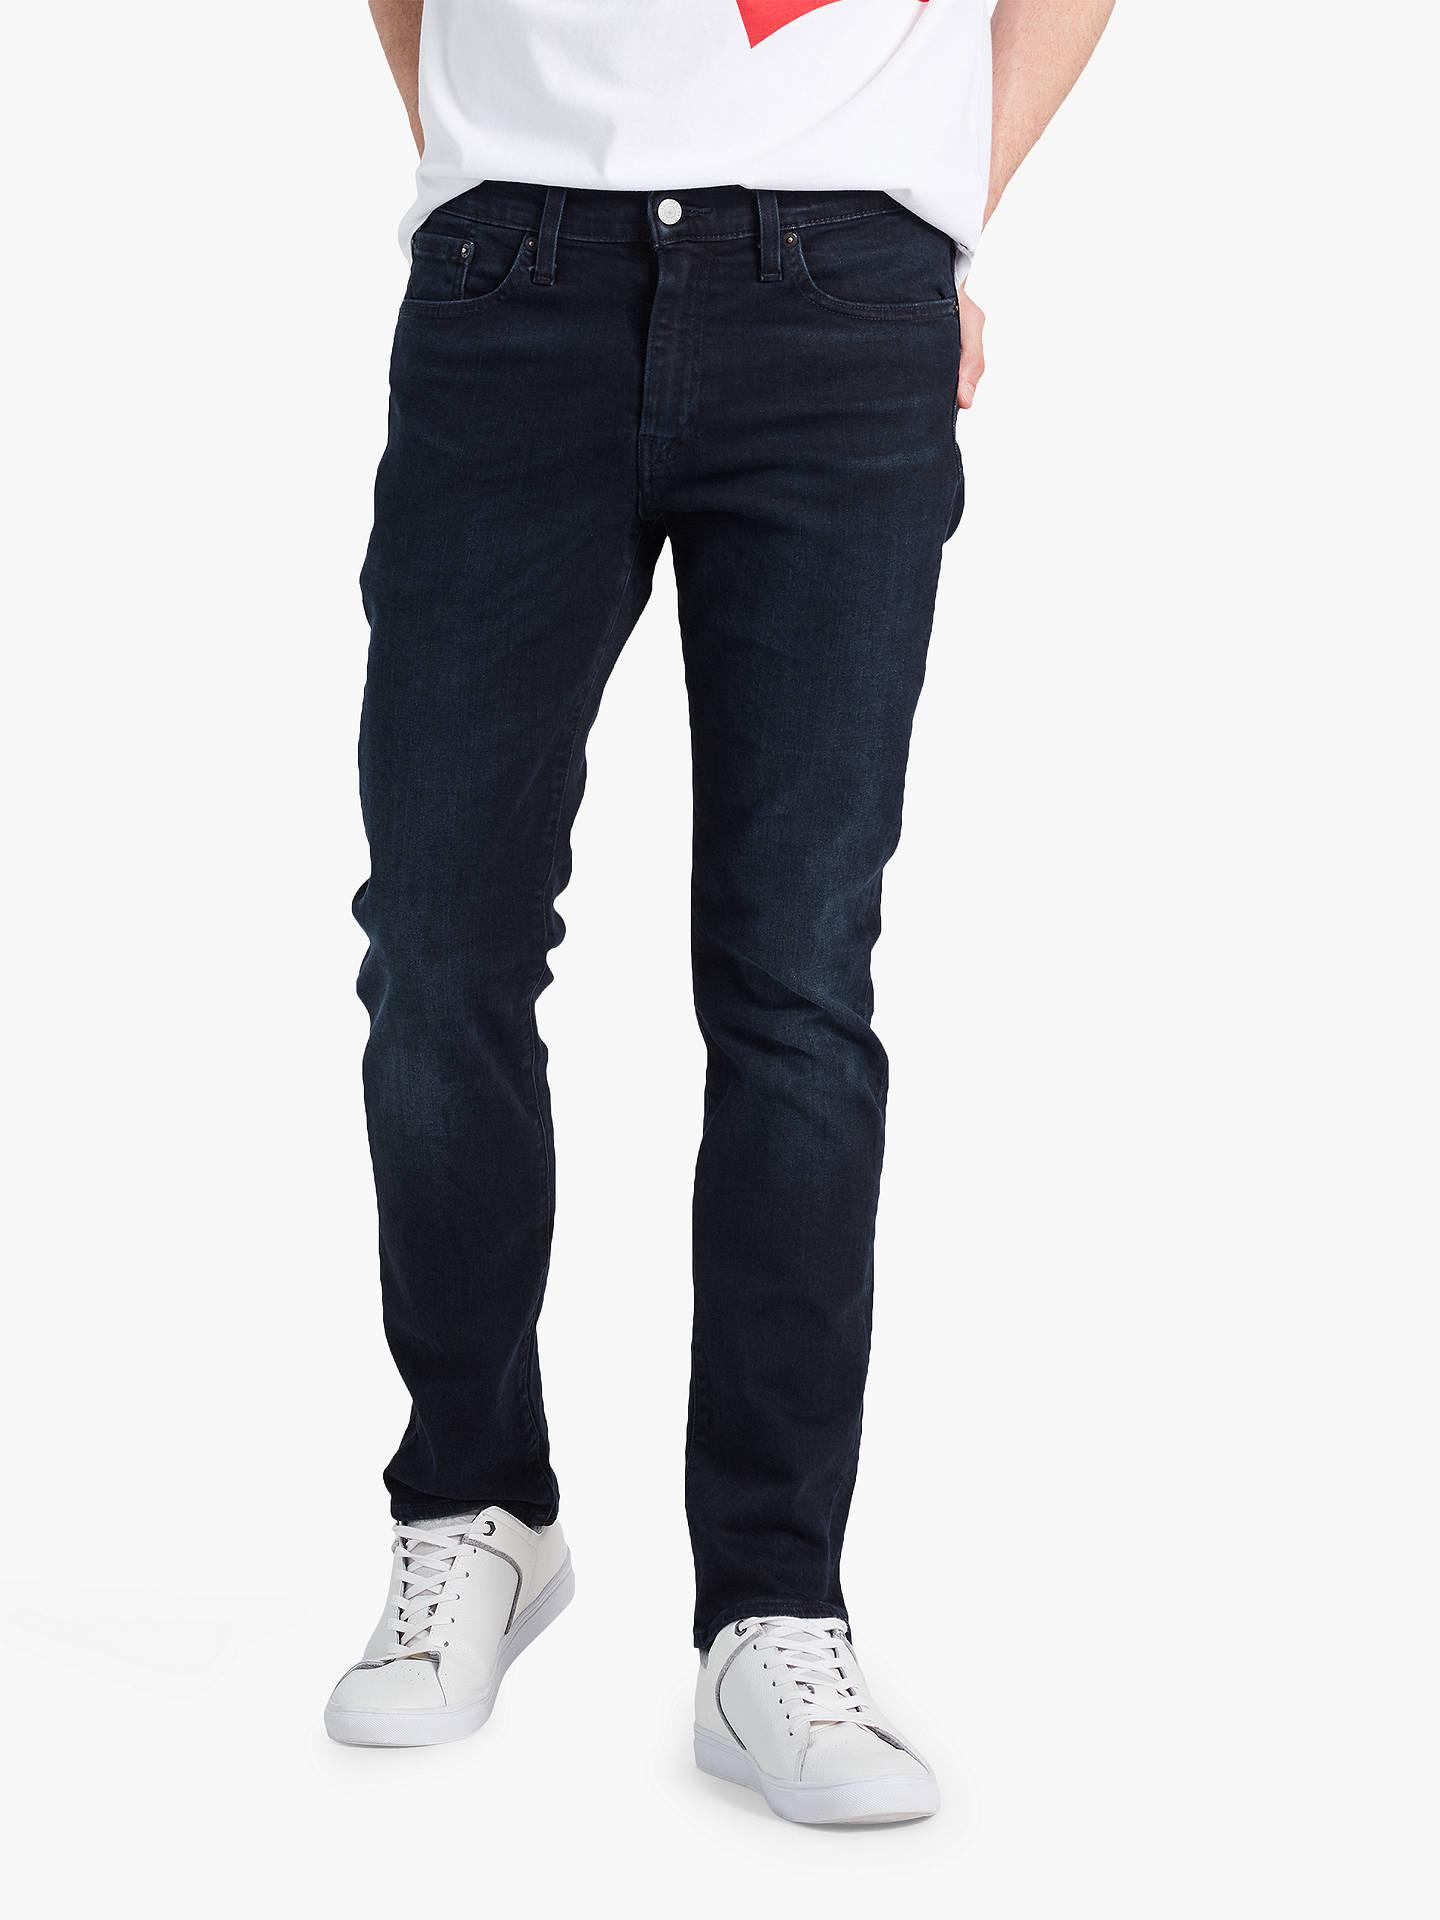 d95d4125439 Buy Levi's 511 Slim Fit Jeans, Rajah Adv, 34R Online at johnlewis. ...